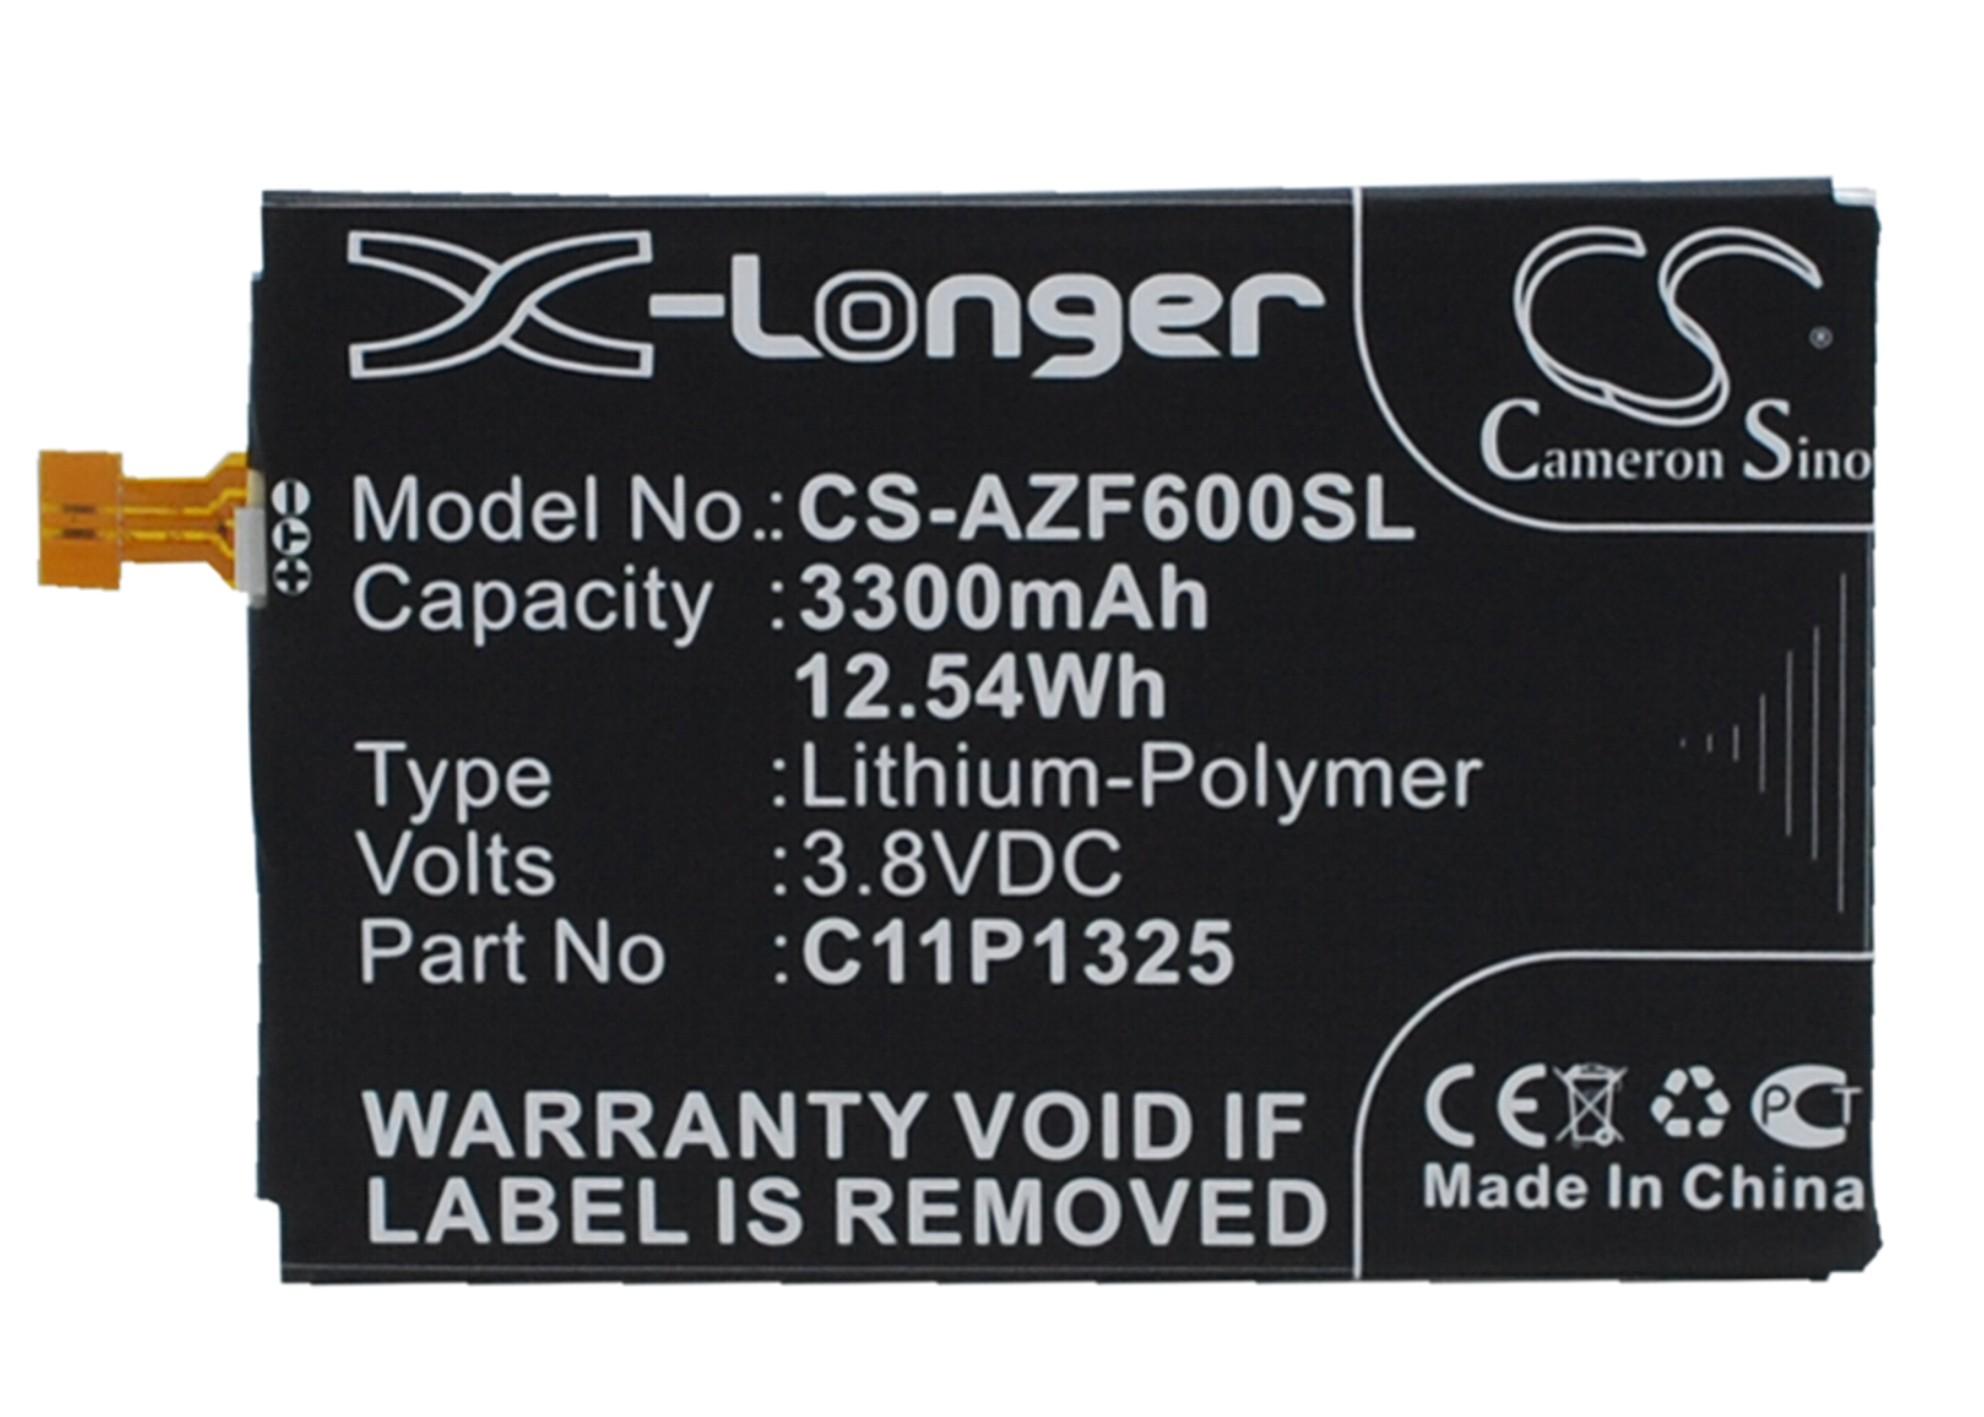 Cameron Sino baterie do mobilů pro ASUS A600CG 3.8V Li-Polymer 3300mAh černá - neoriginální